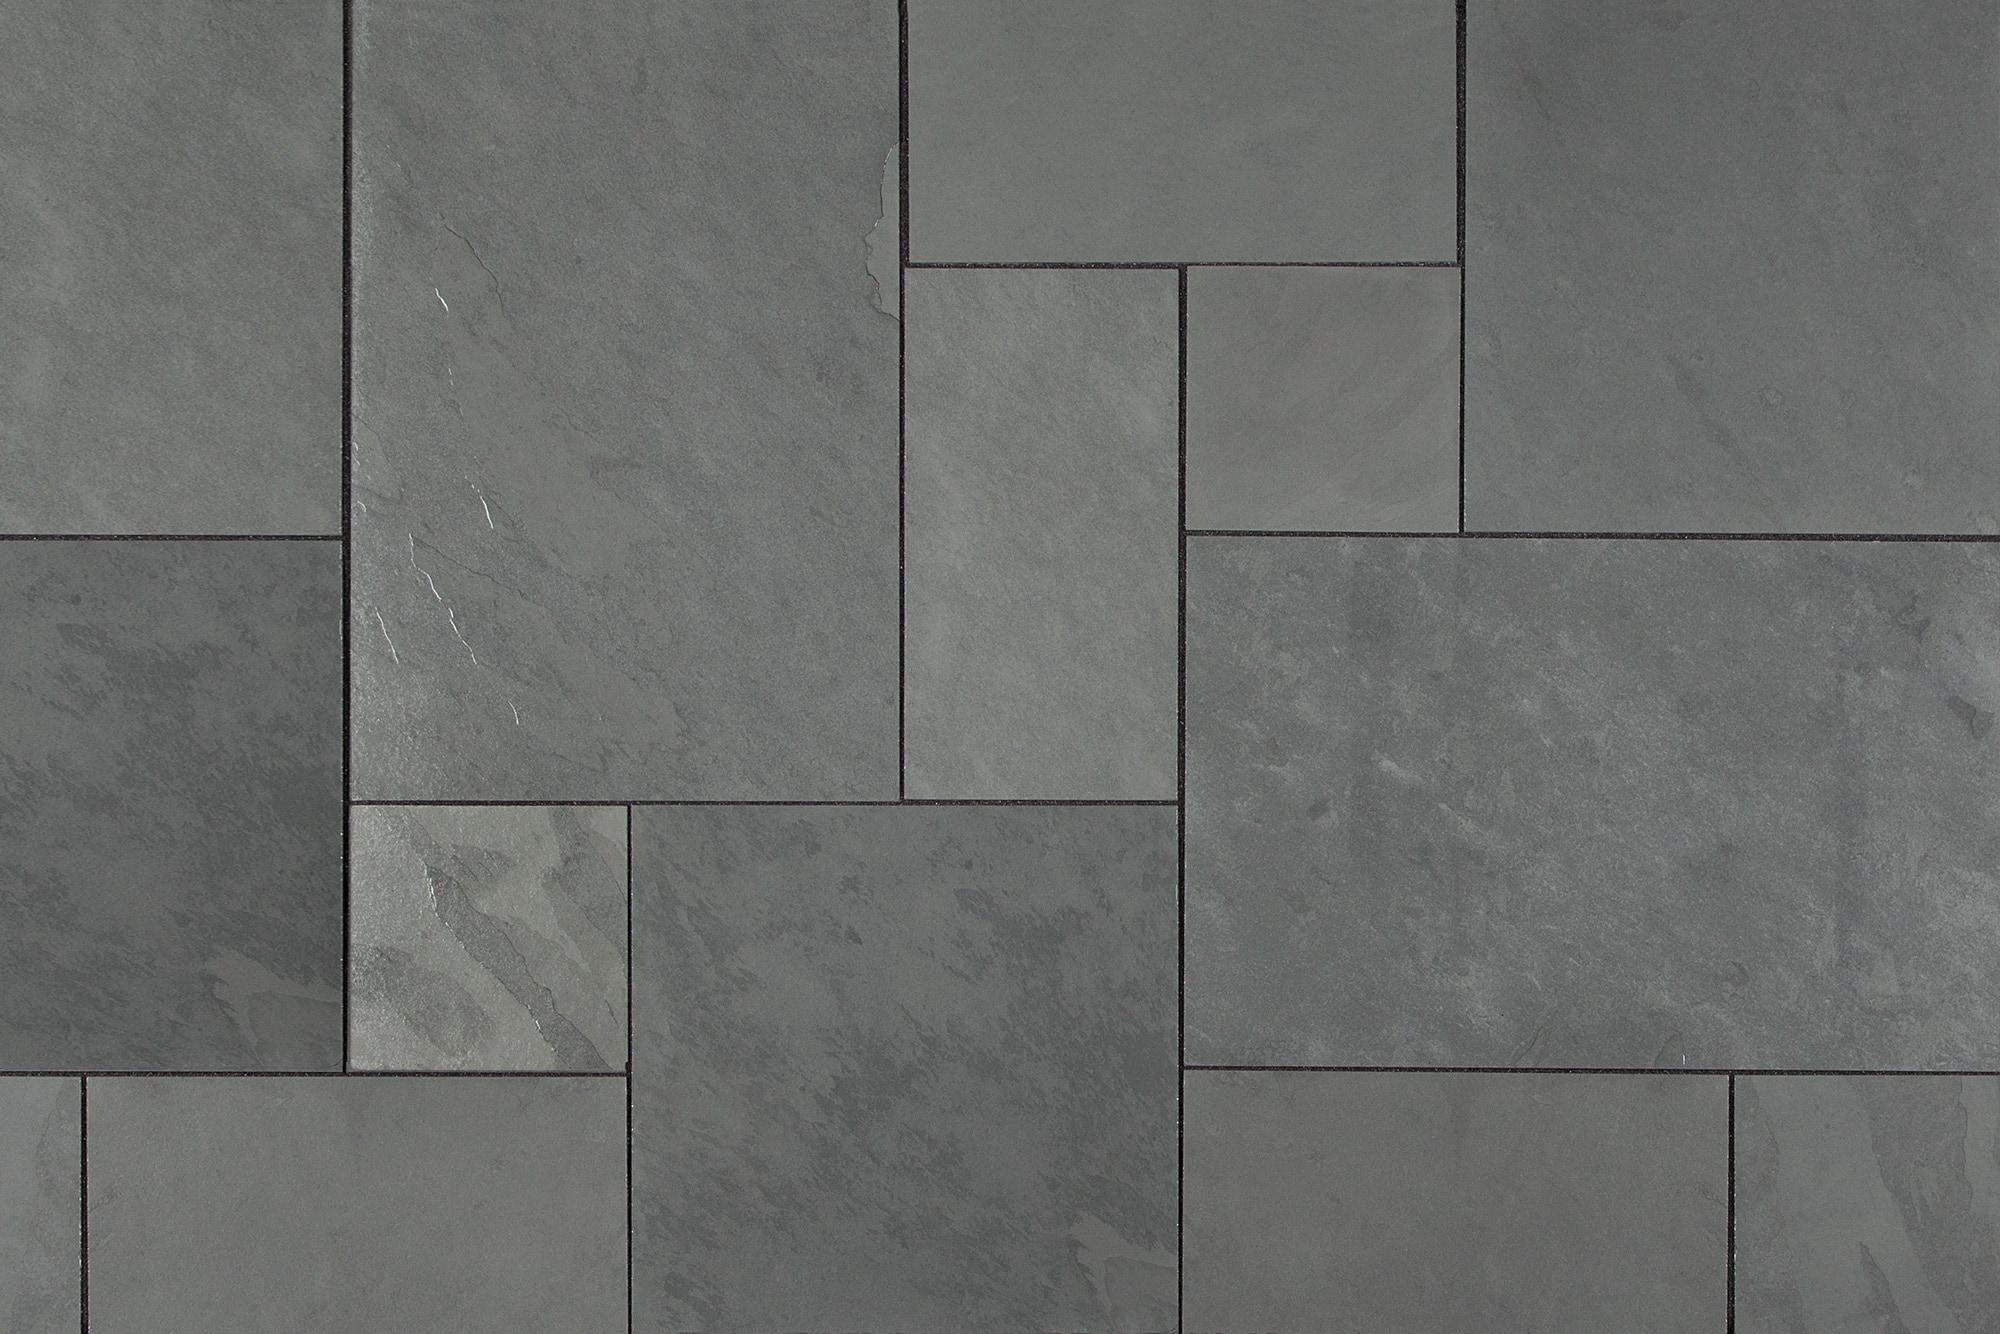 Janeiro slate tile versailles pattern montauk blue versailles janeiro slate tile versailles pattern montauk blue versailles pattern dailygadgetfo Images